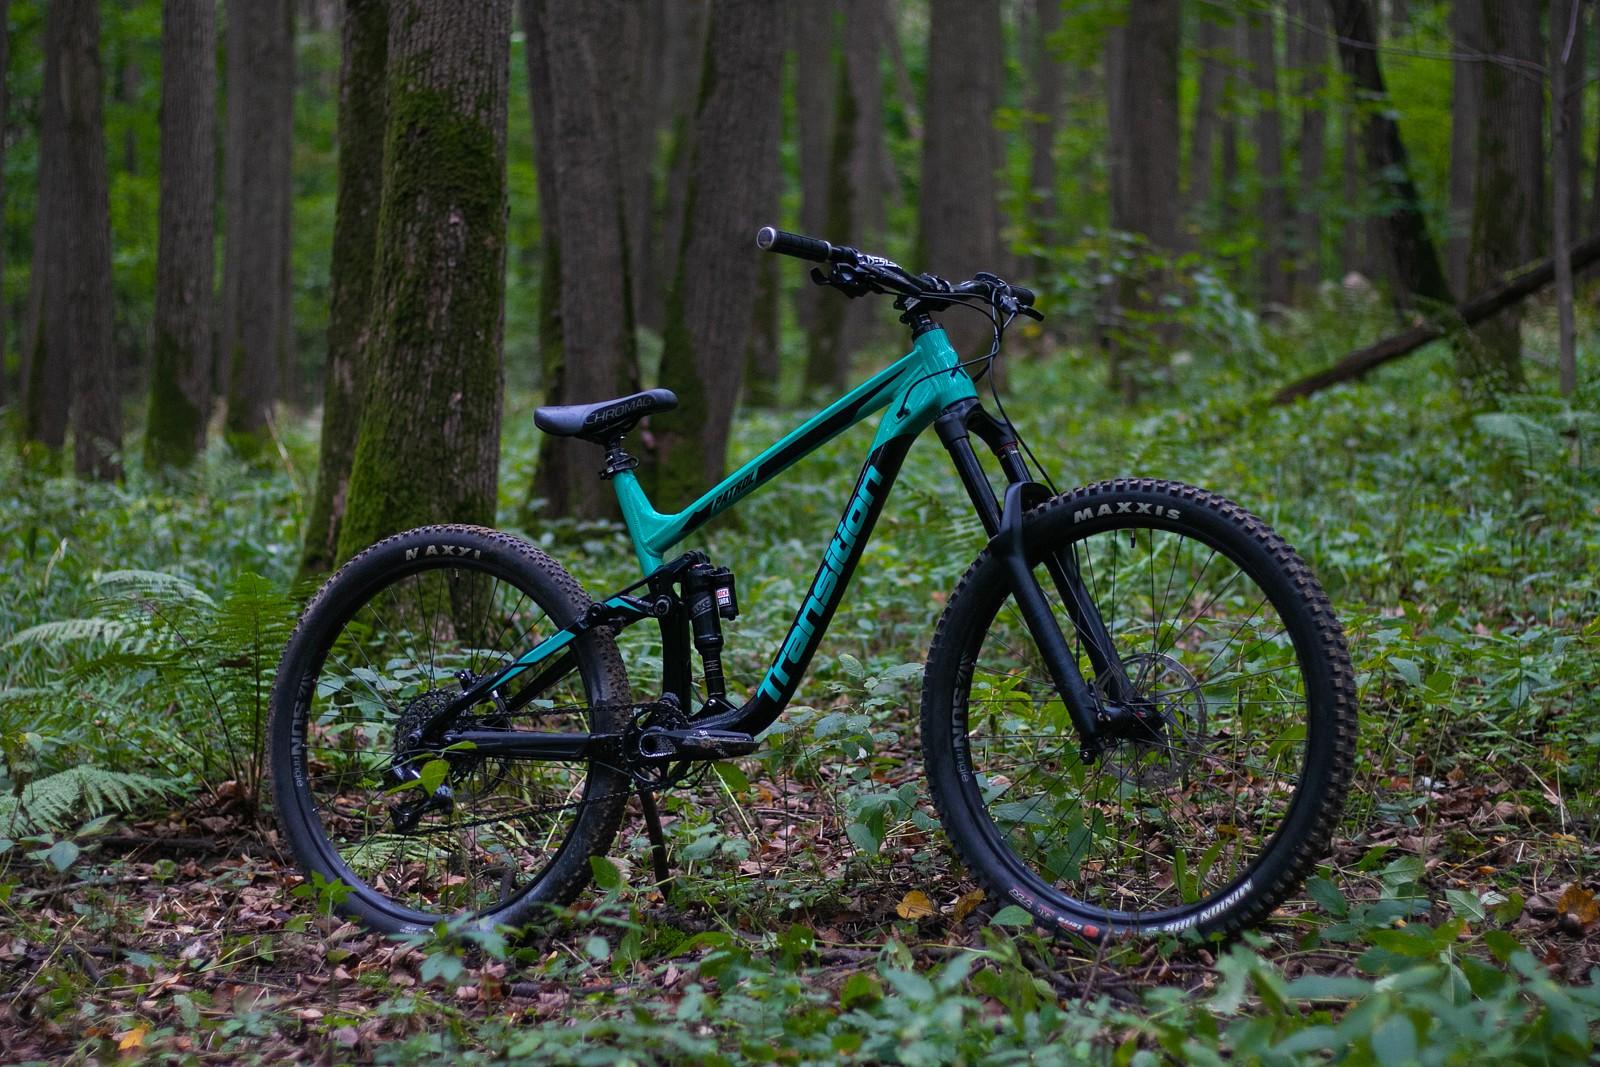 IMG 8772 - SlayzHate - Mountain Biking Pictures - Vital MTB